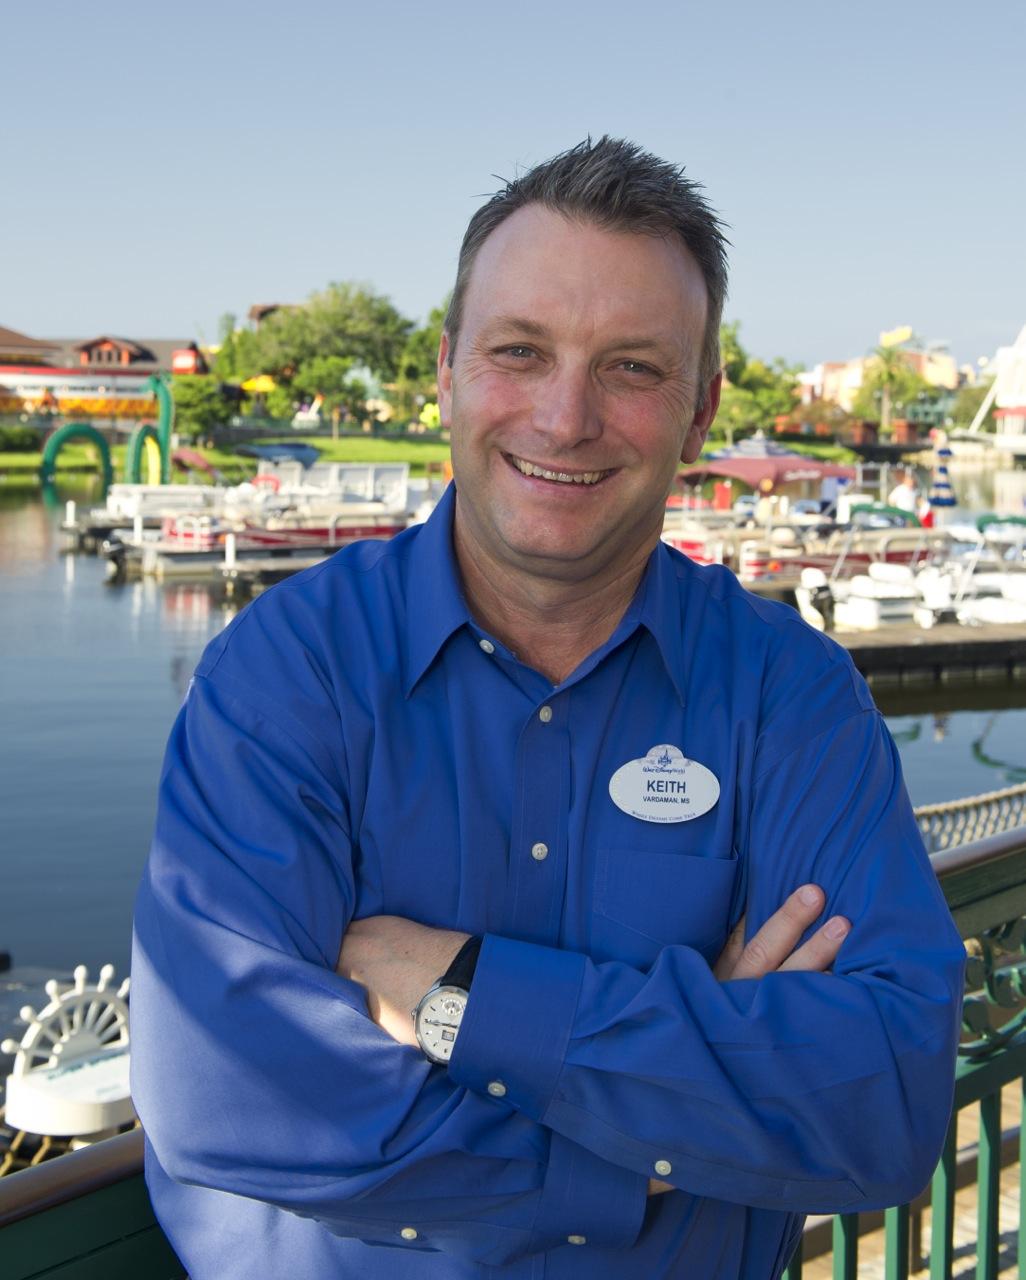 Keith Bradford, WOCC Chairman